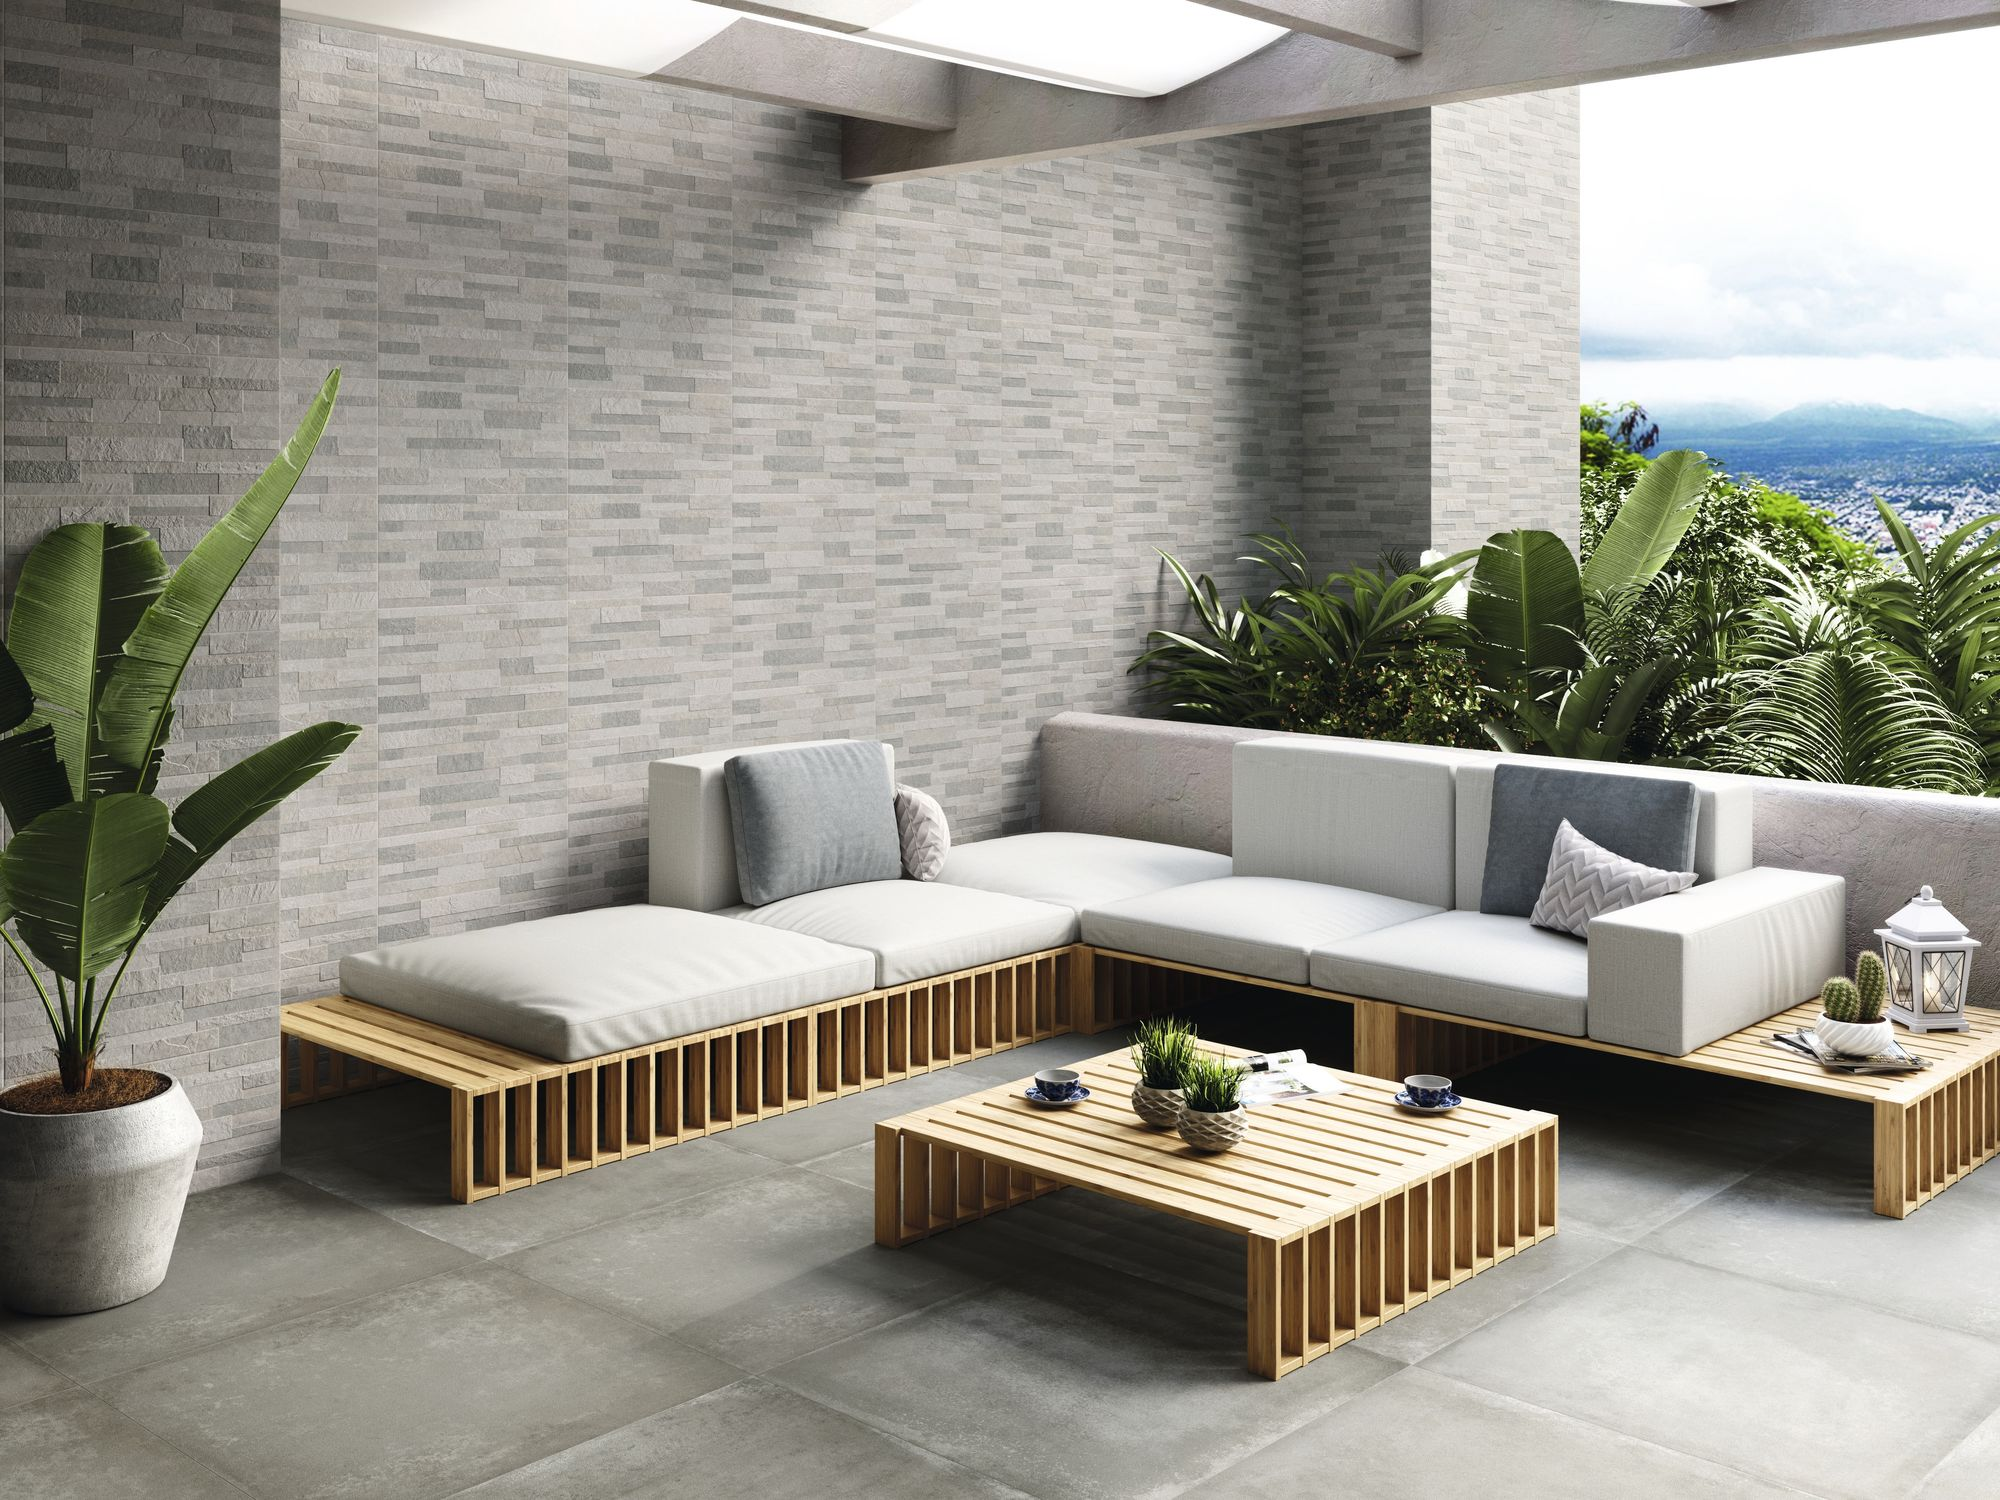 Brick Stone Winter Mix 30x60 cm. Pavimento Grafton Grey 80x80 cm.